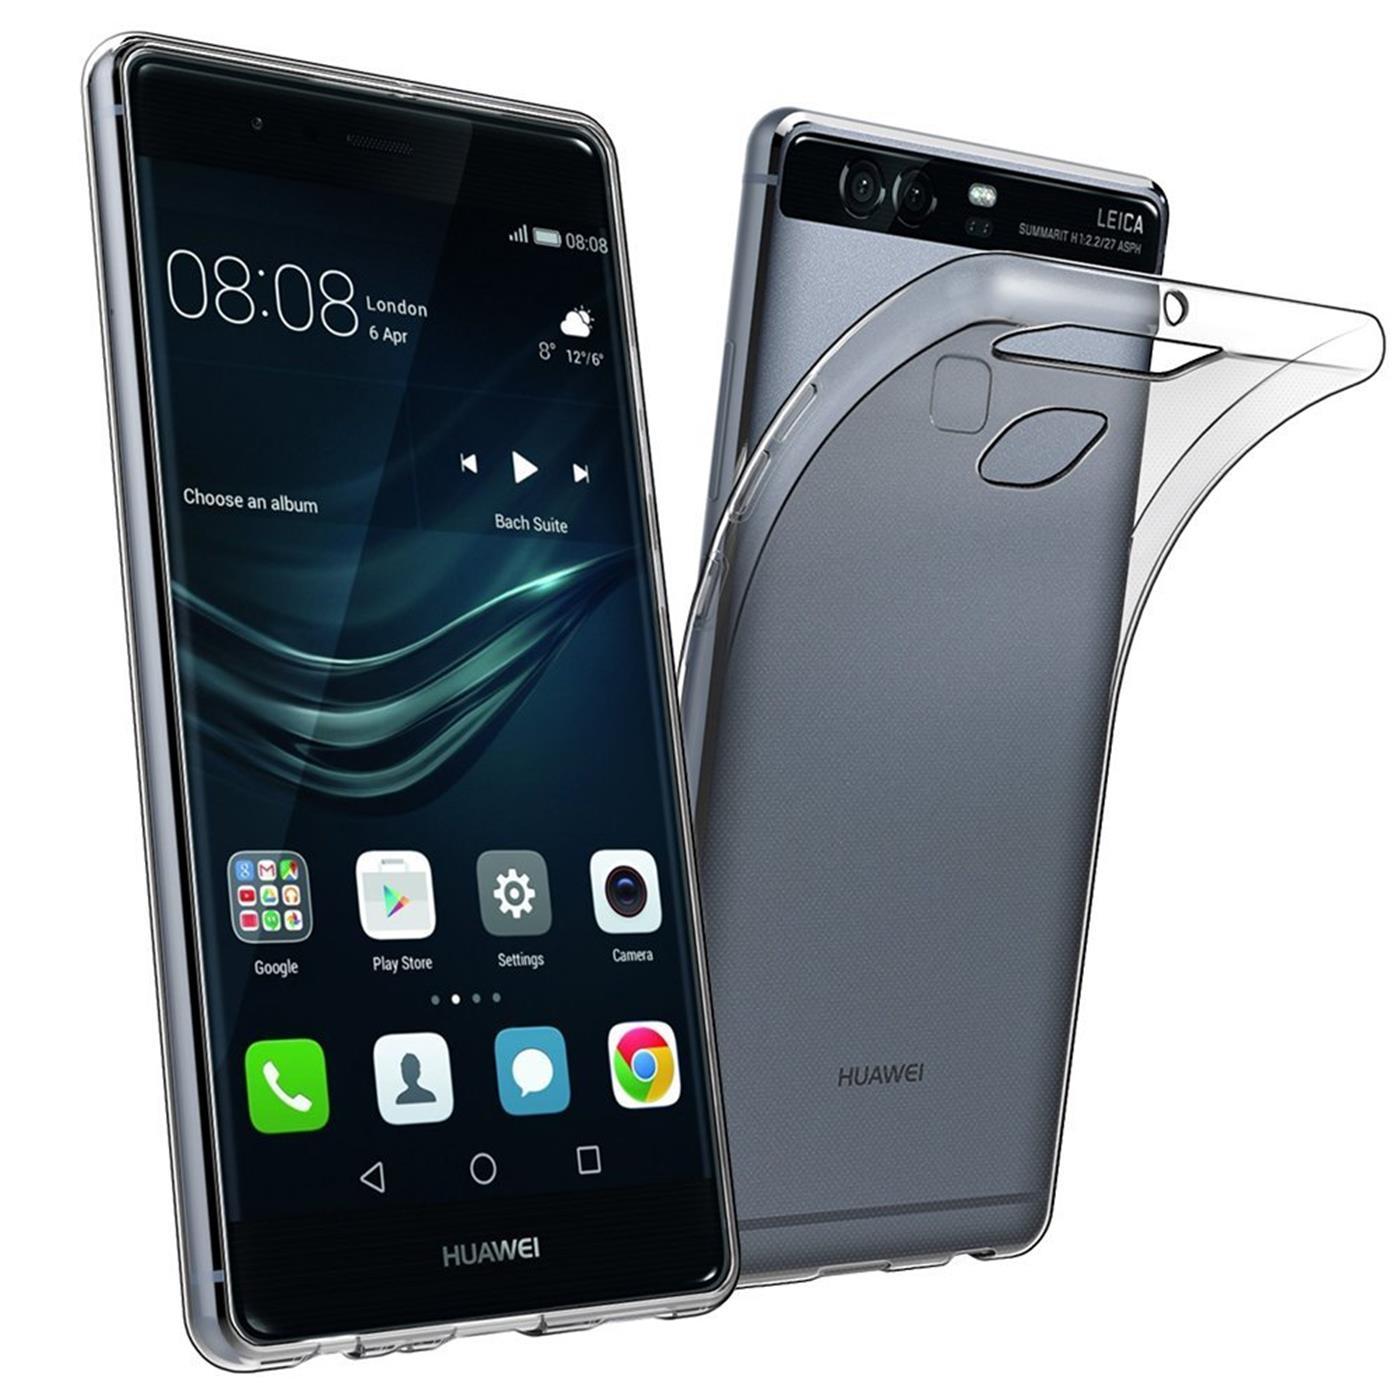 Huawei-p9-Duenn-Silikon-Klar-Case-Cover-Ultra-Slim-Stossfeste-Gel-Rueckseite Indexbild 4